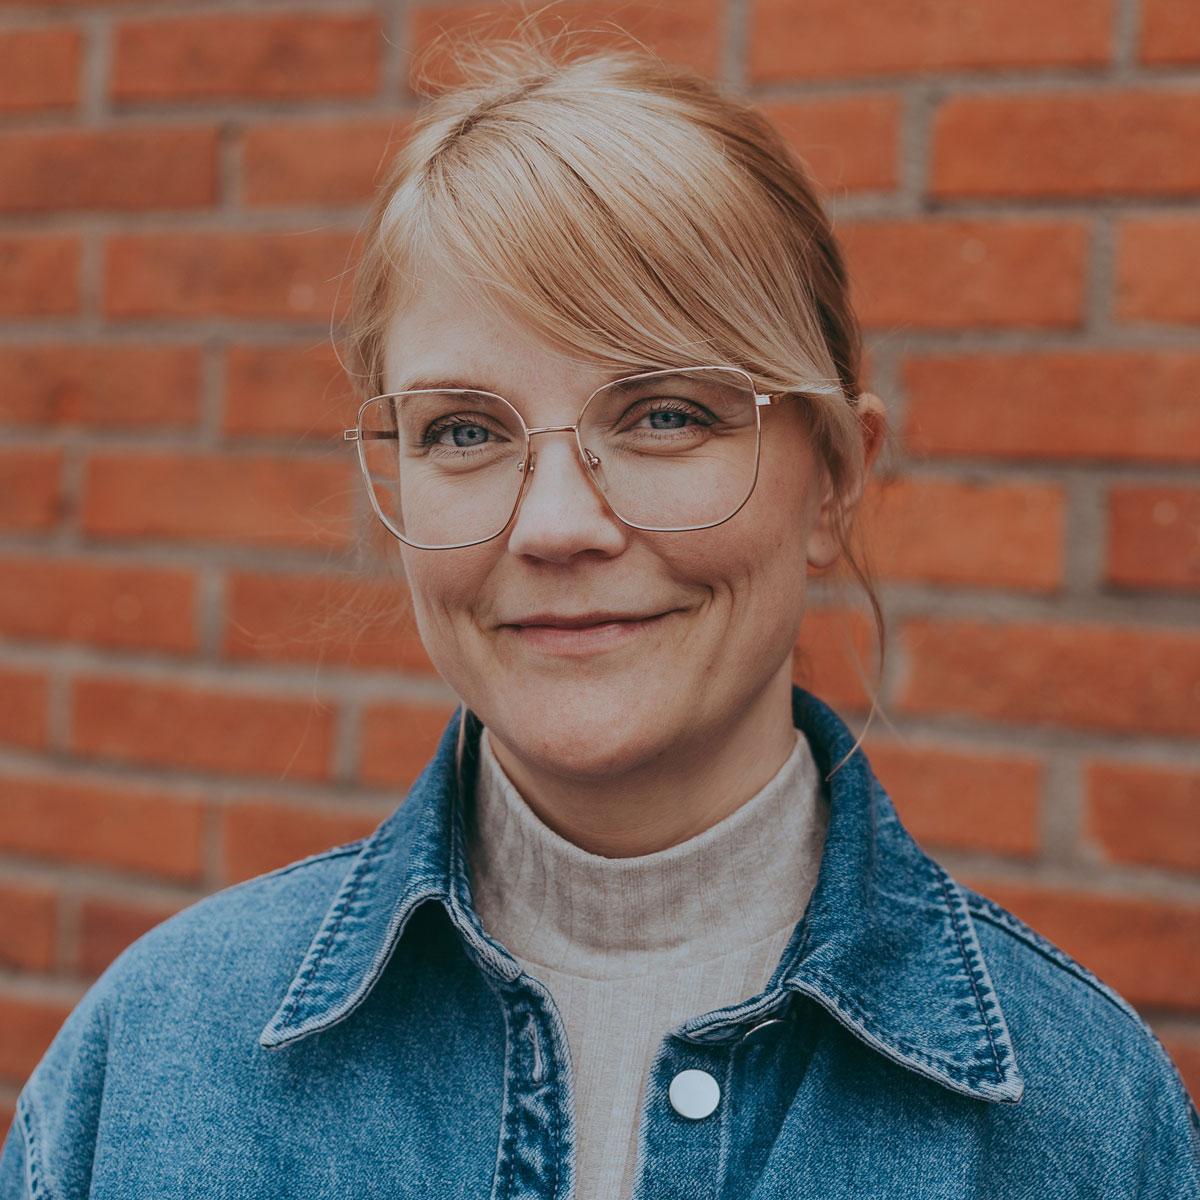 Ingela Johannesson, Lärare Allmän kurs 1, Ålidhem